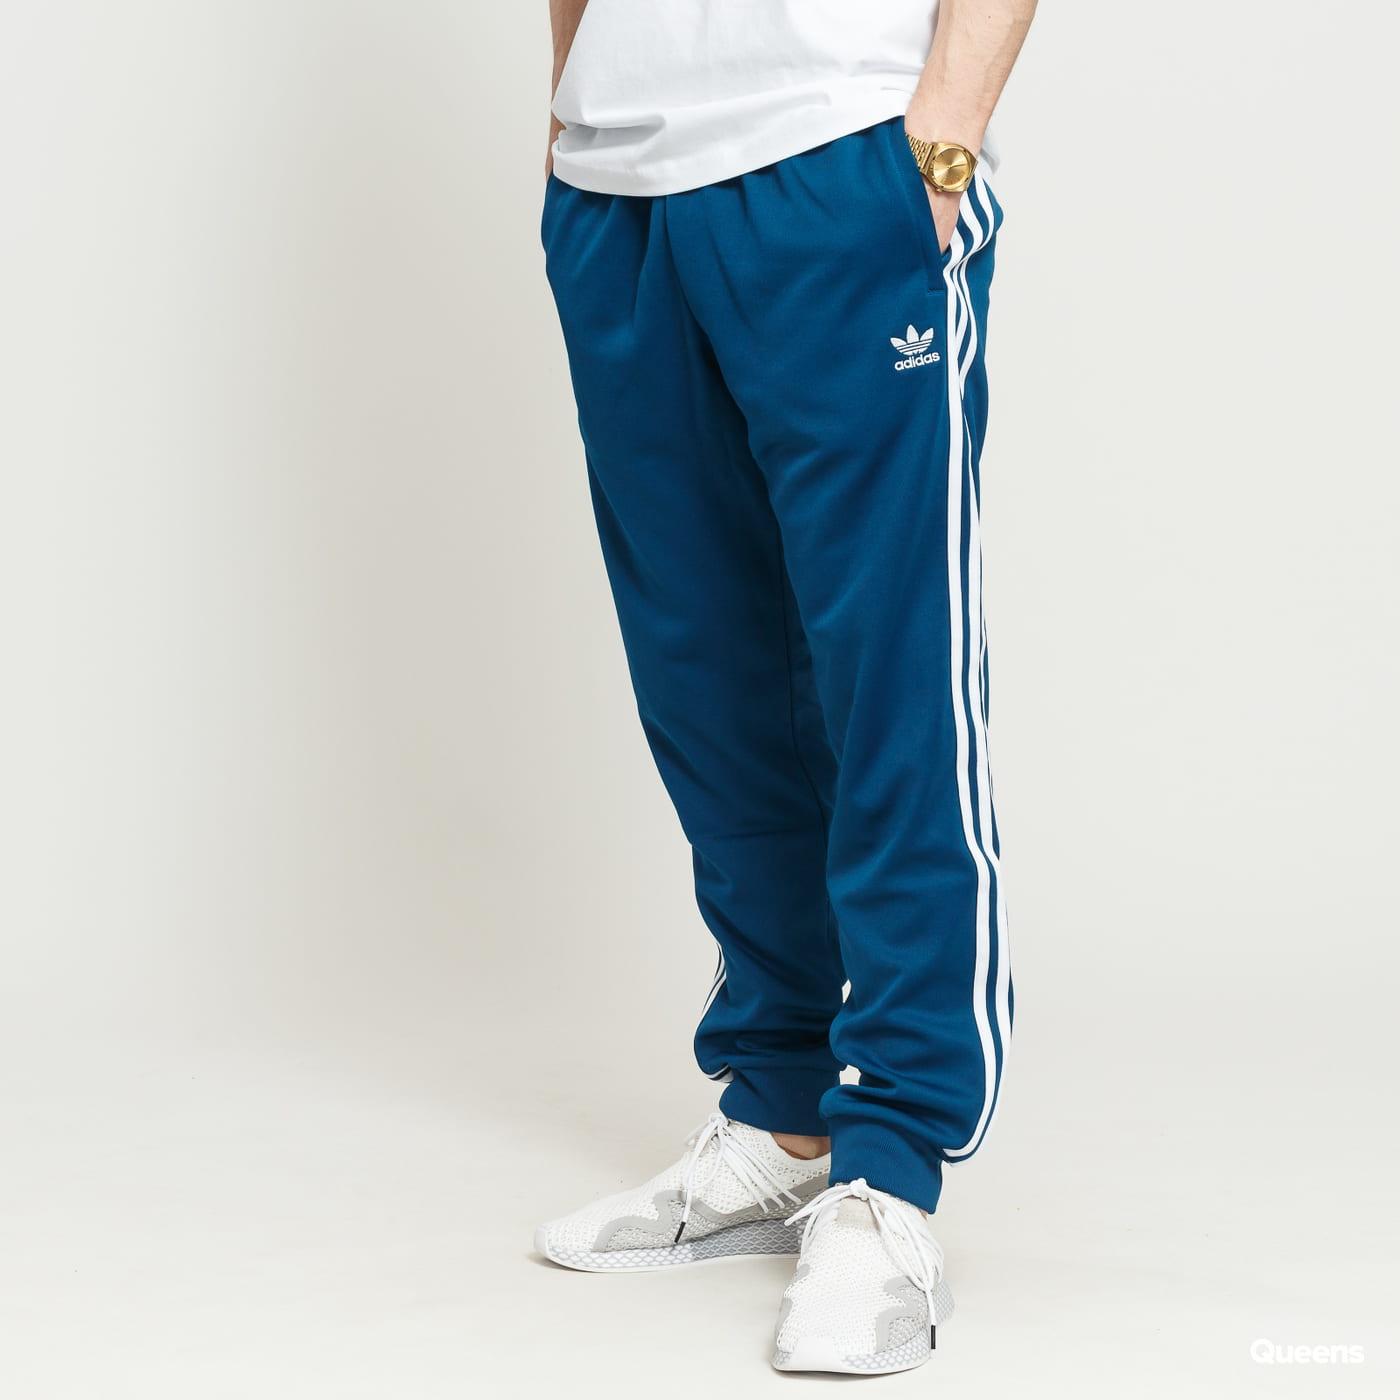 fantastic savings big sale quality adidas Originals SST Track Pant dunkelblau